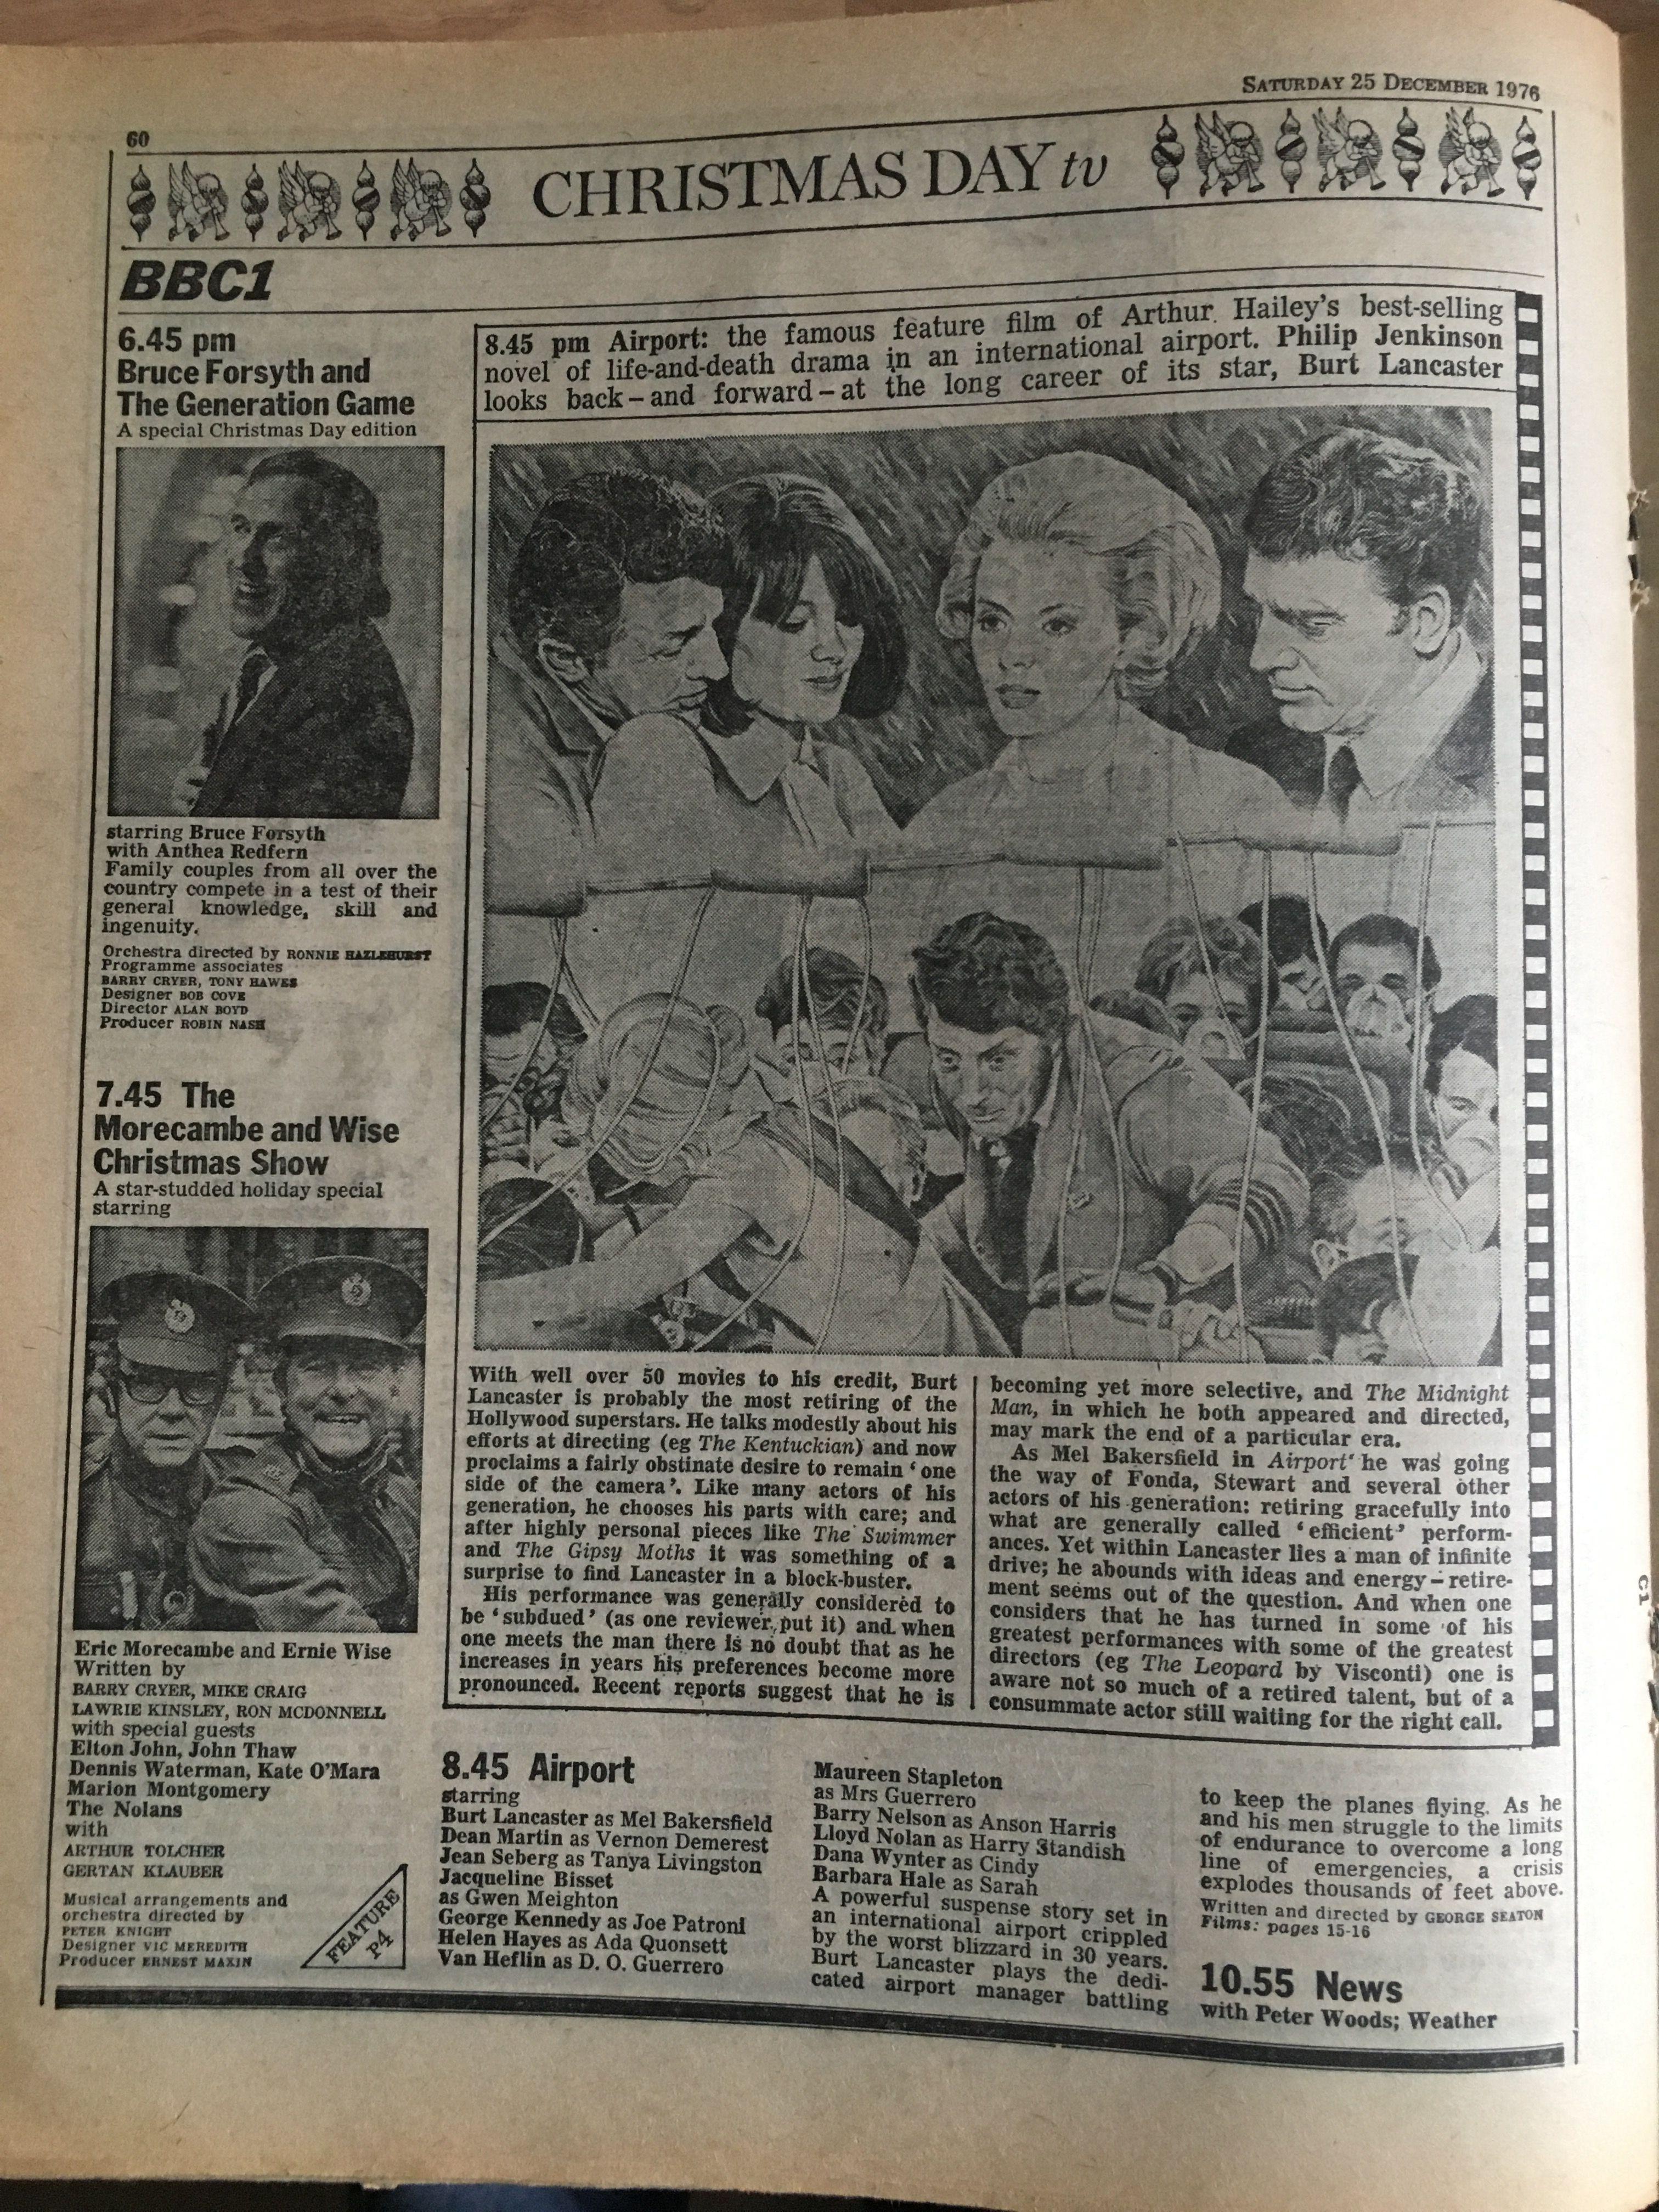 Pin by David Henningham on Nostalgic Christmas Radio Times